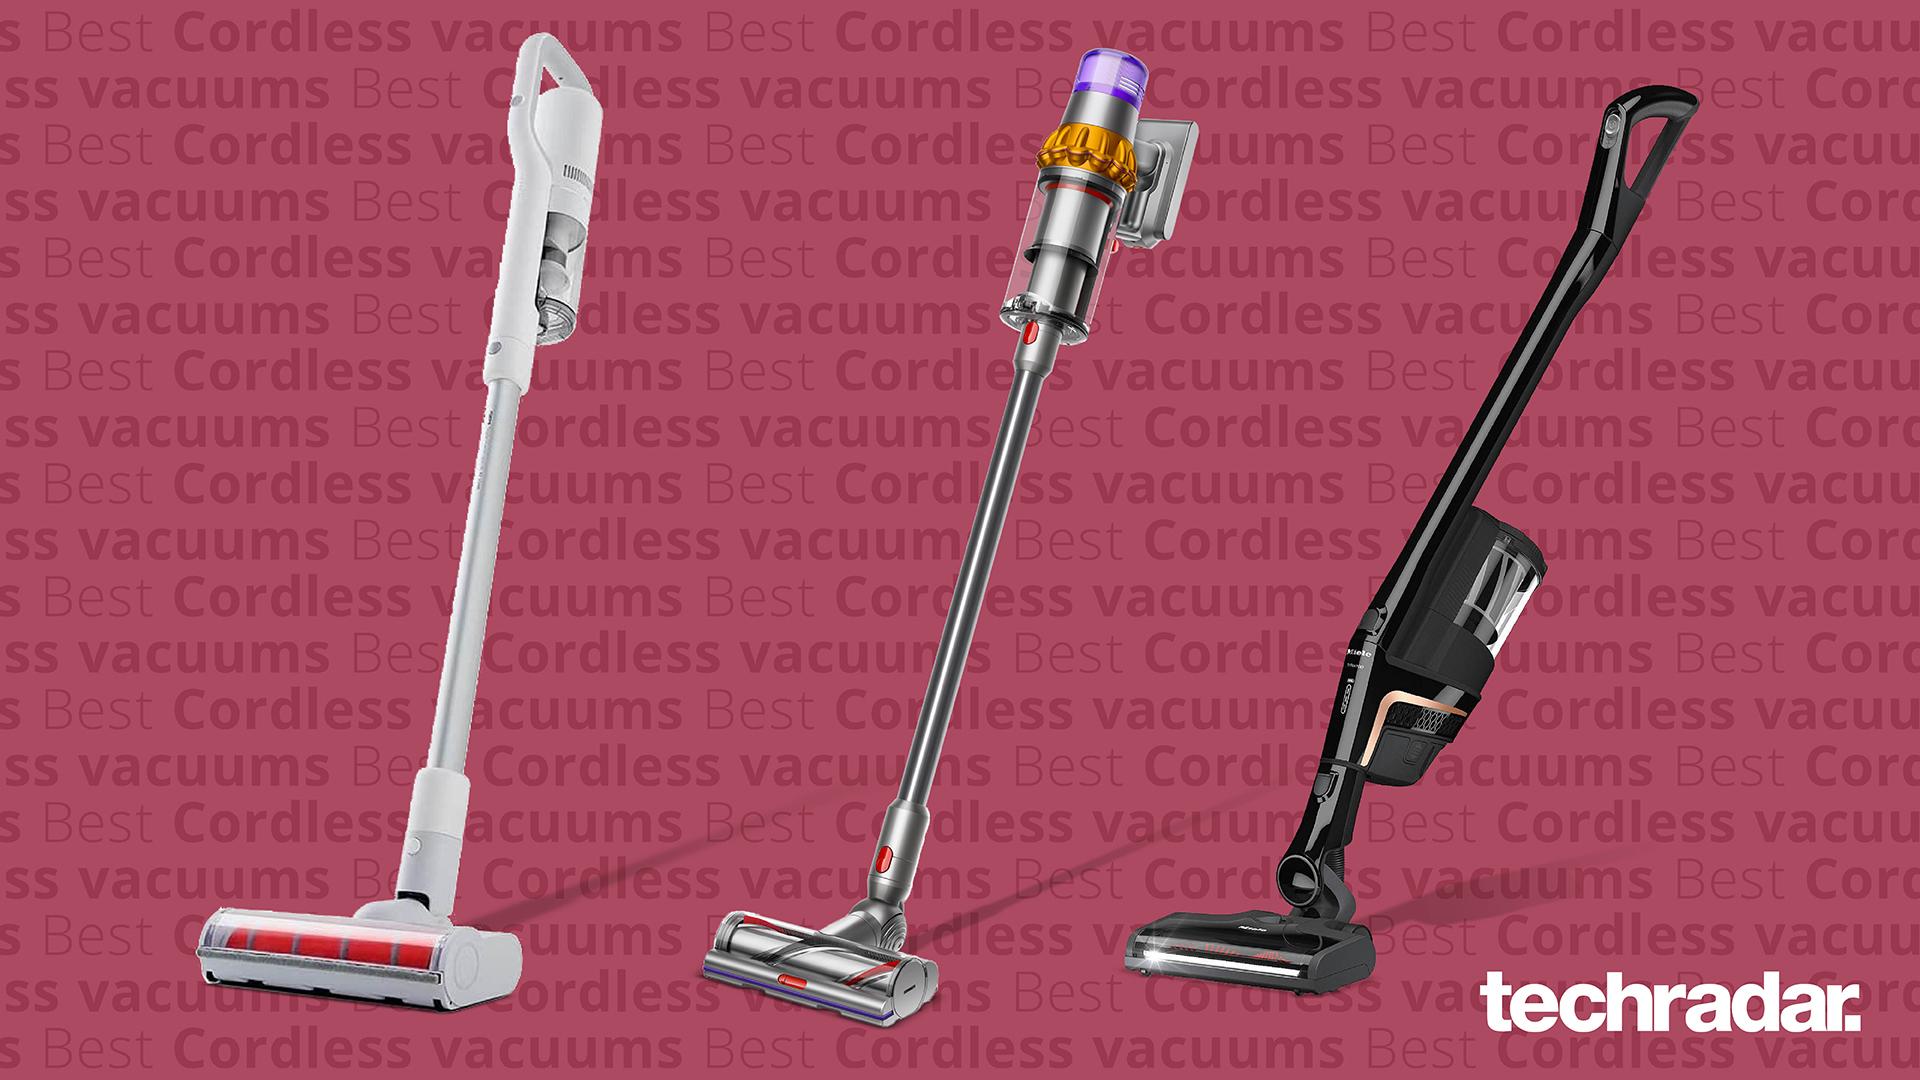 Best Cordless Vacuum 2021 The Top